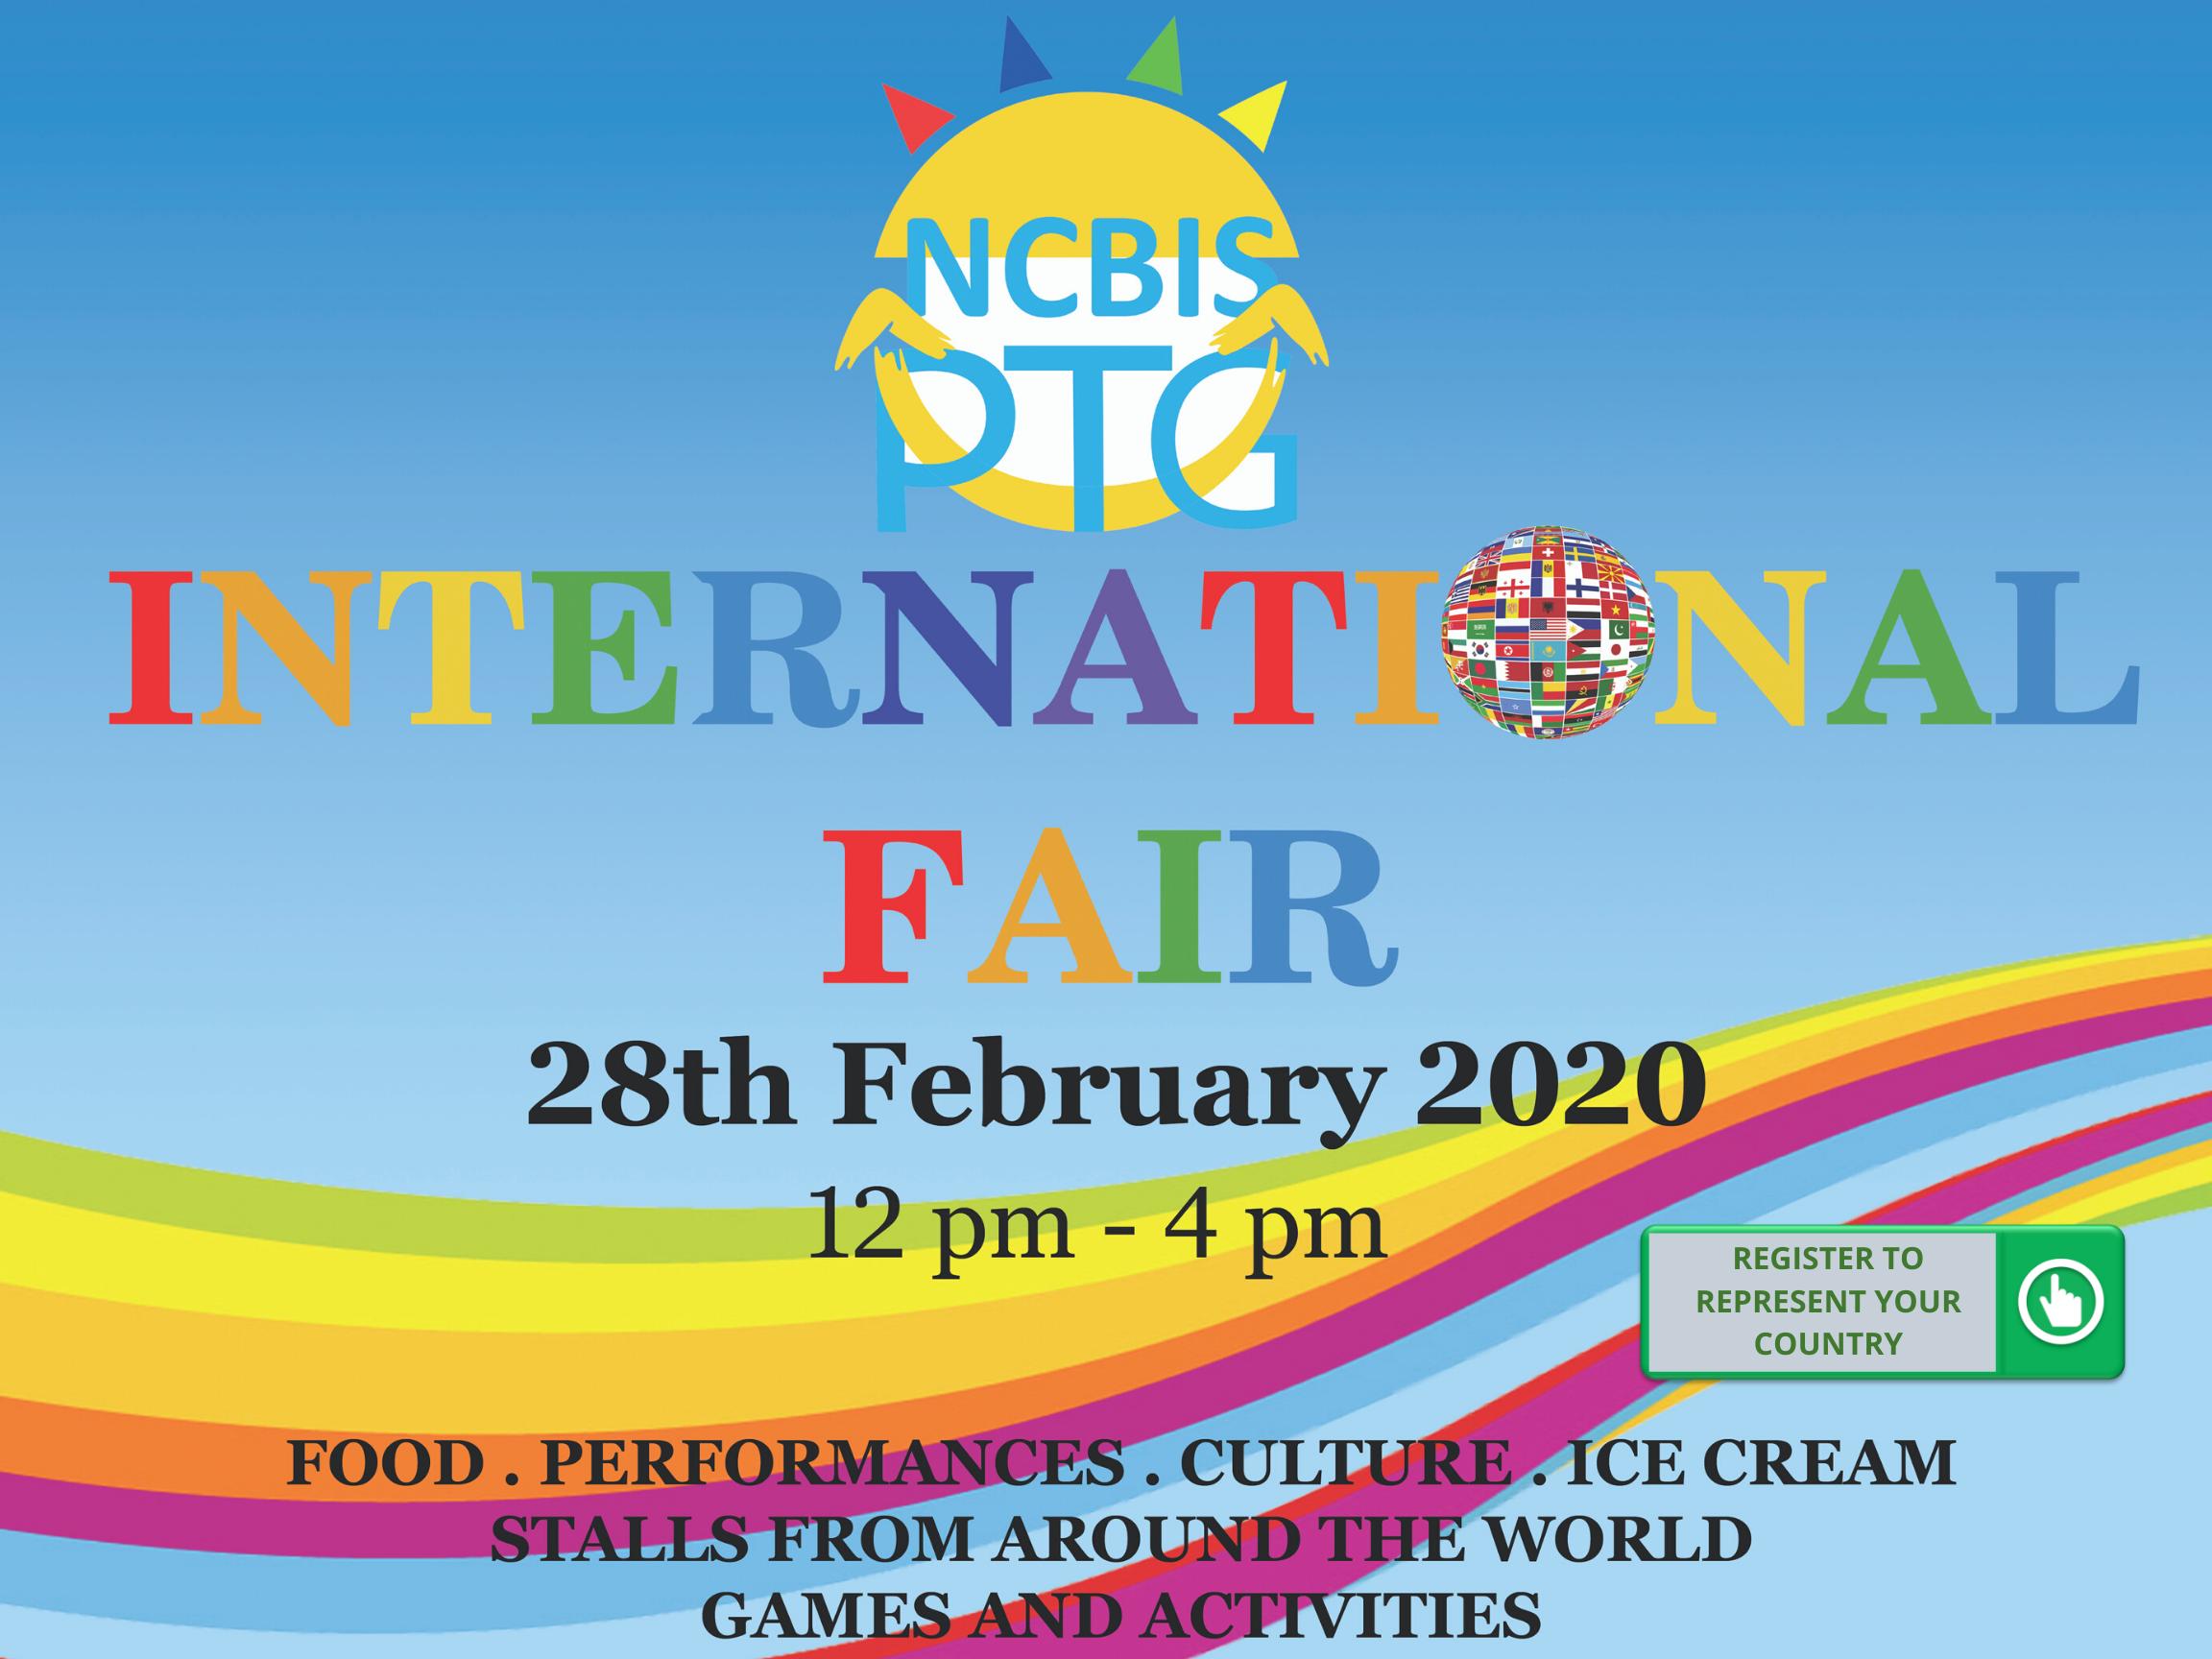 International Fair 2020